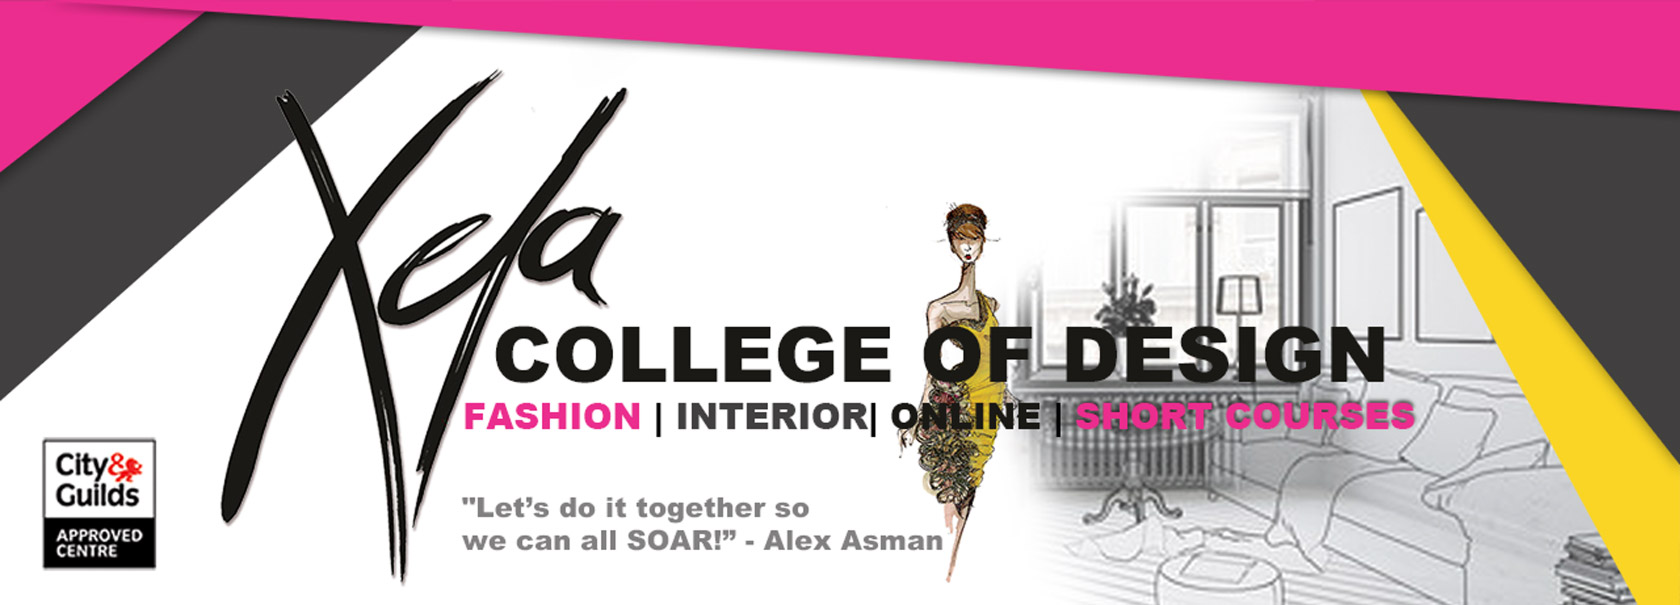 Xela College Of Creative Design